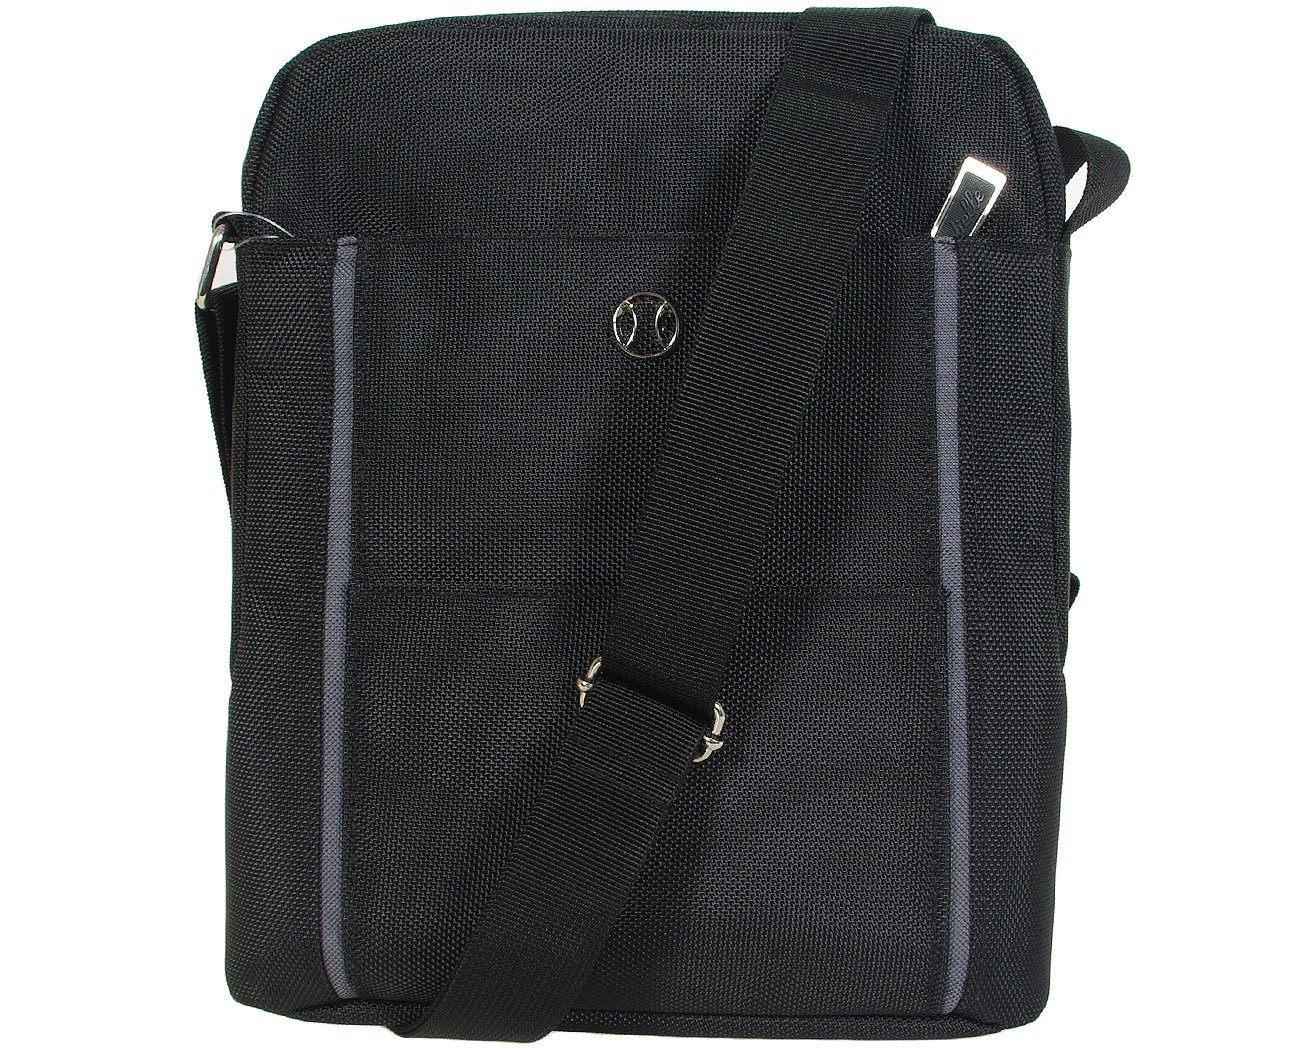 Dielle 7232 Nero torba na ramię